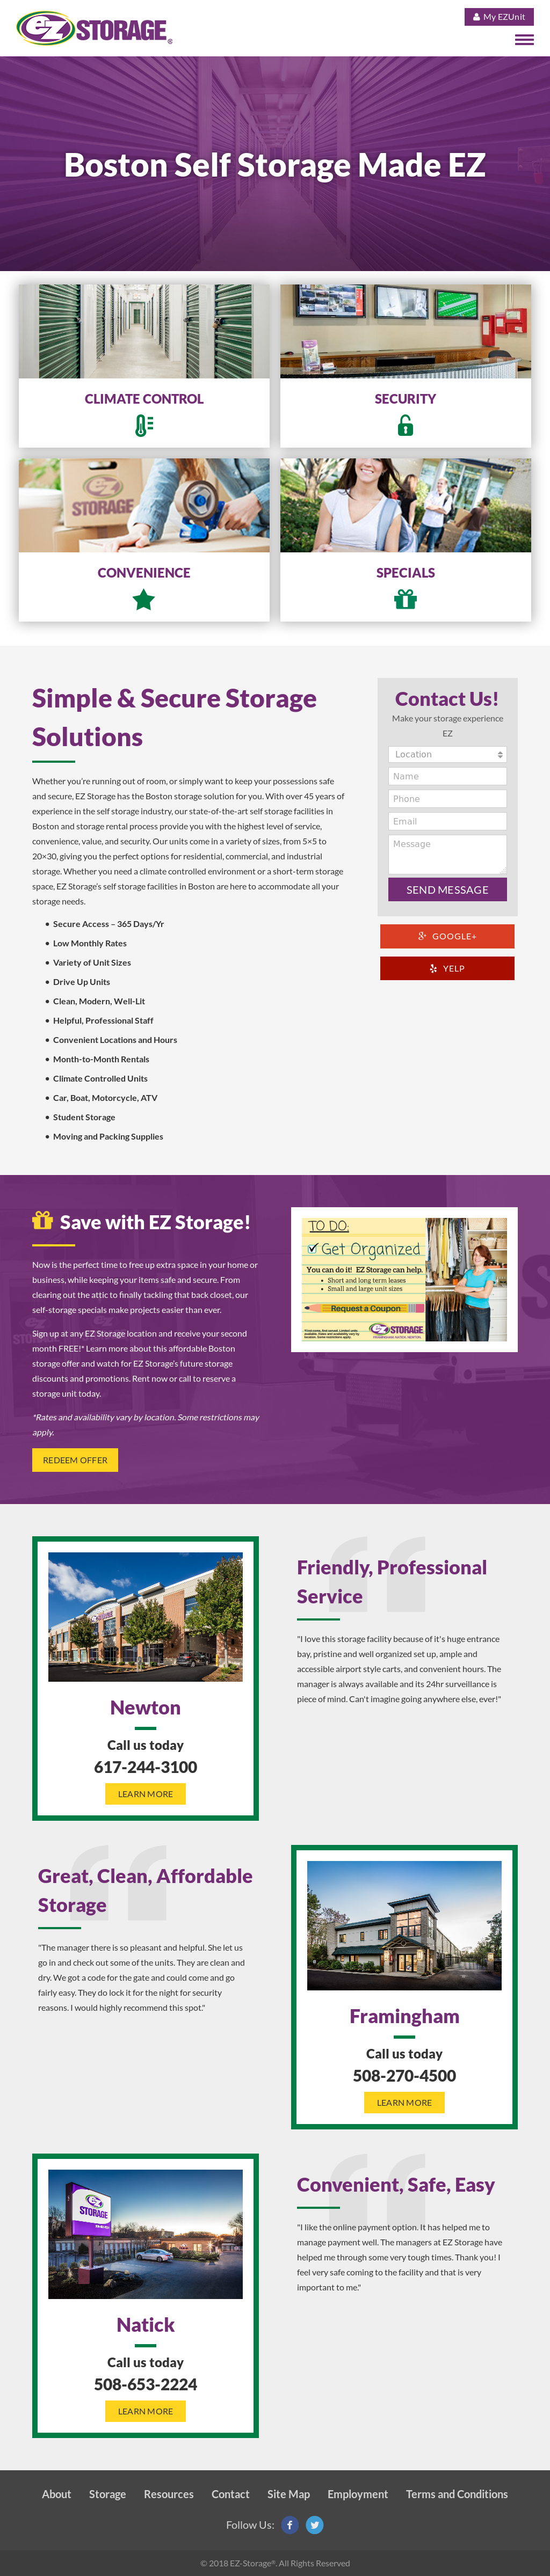 Framingham Ez Storage Amenities Website History